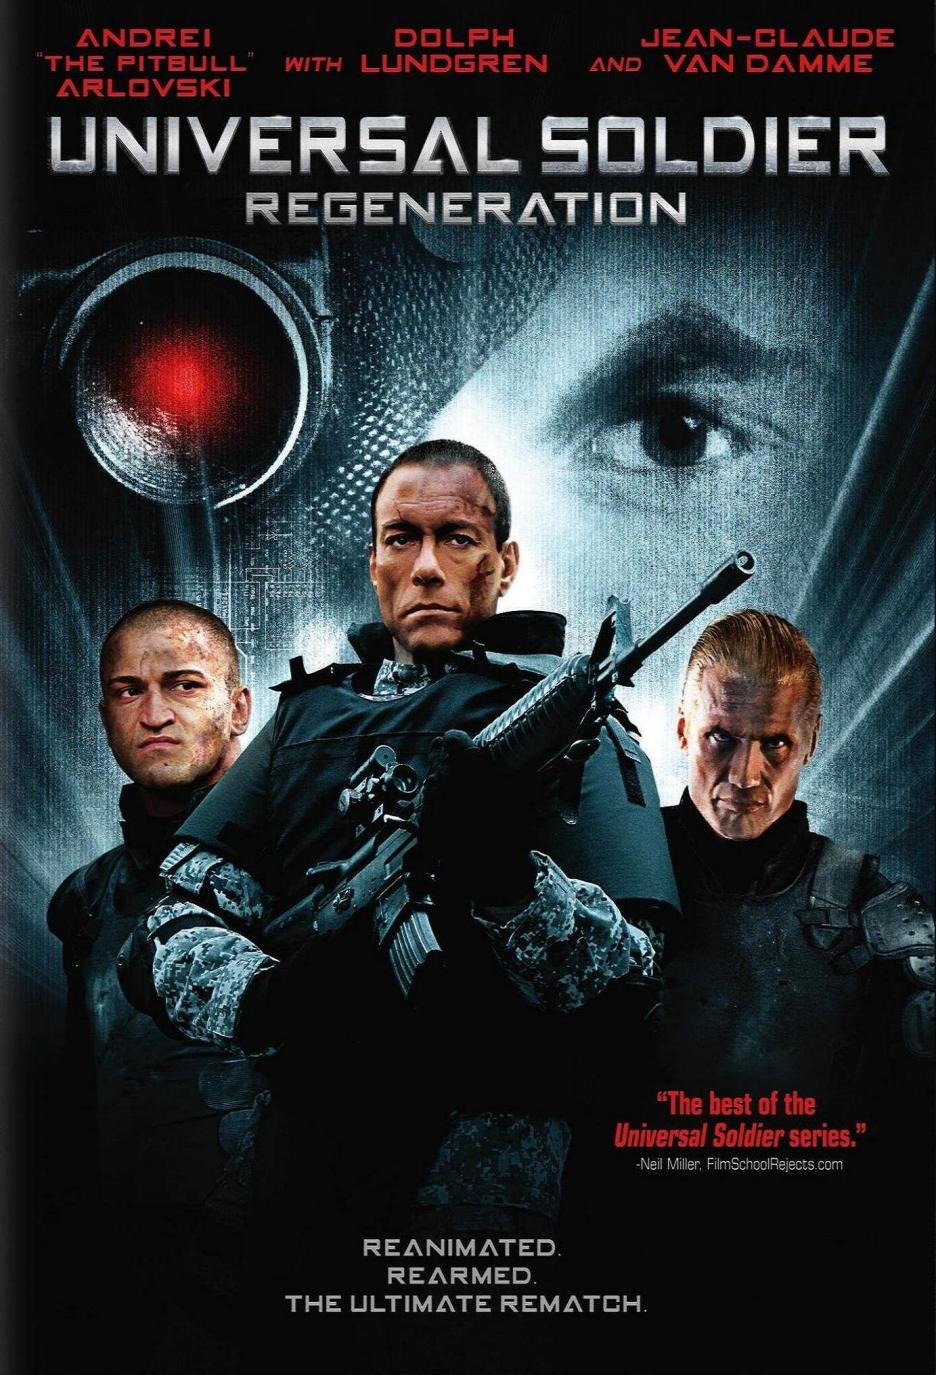 SOLDATUL UNIVERSAL: UN NOU ÎNCEPUT (2009)